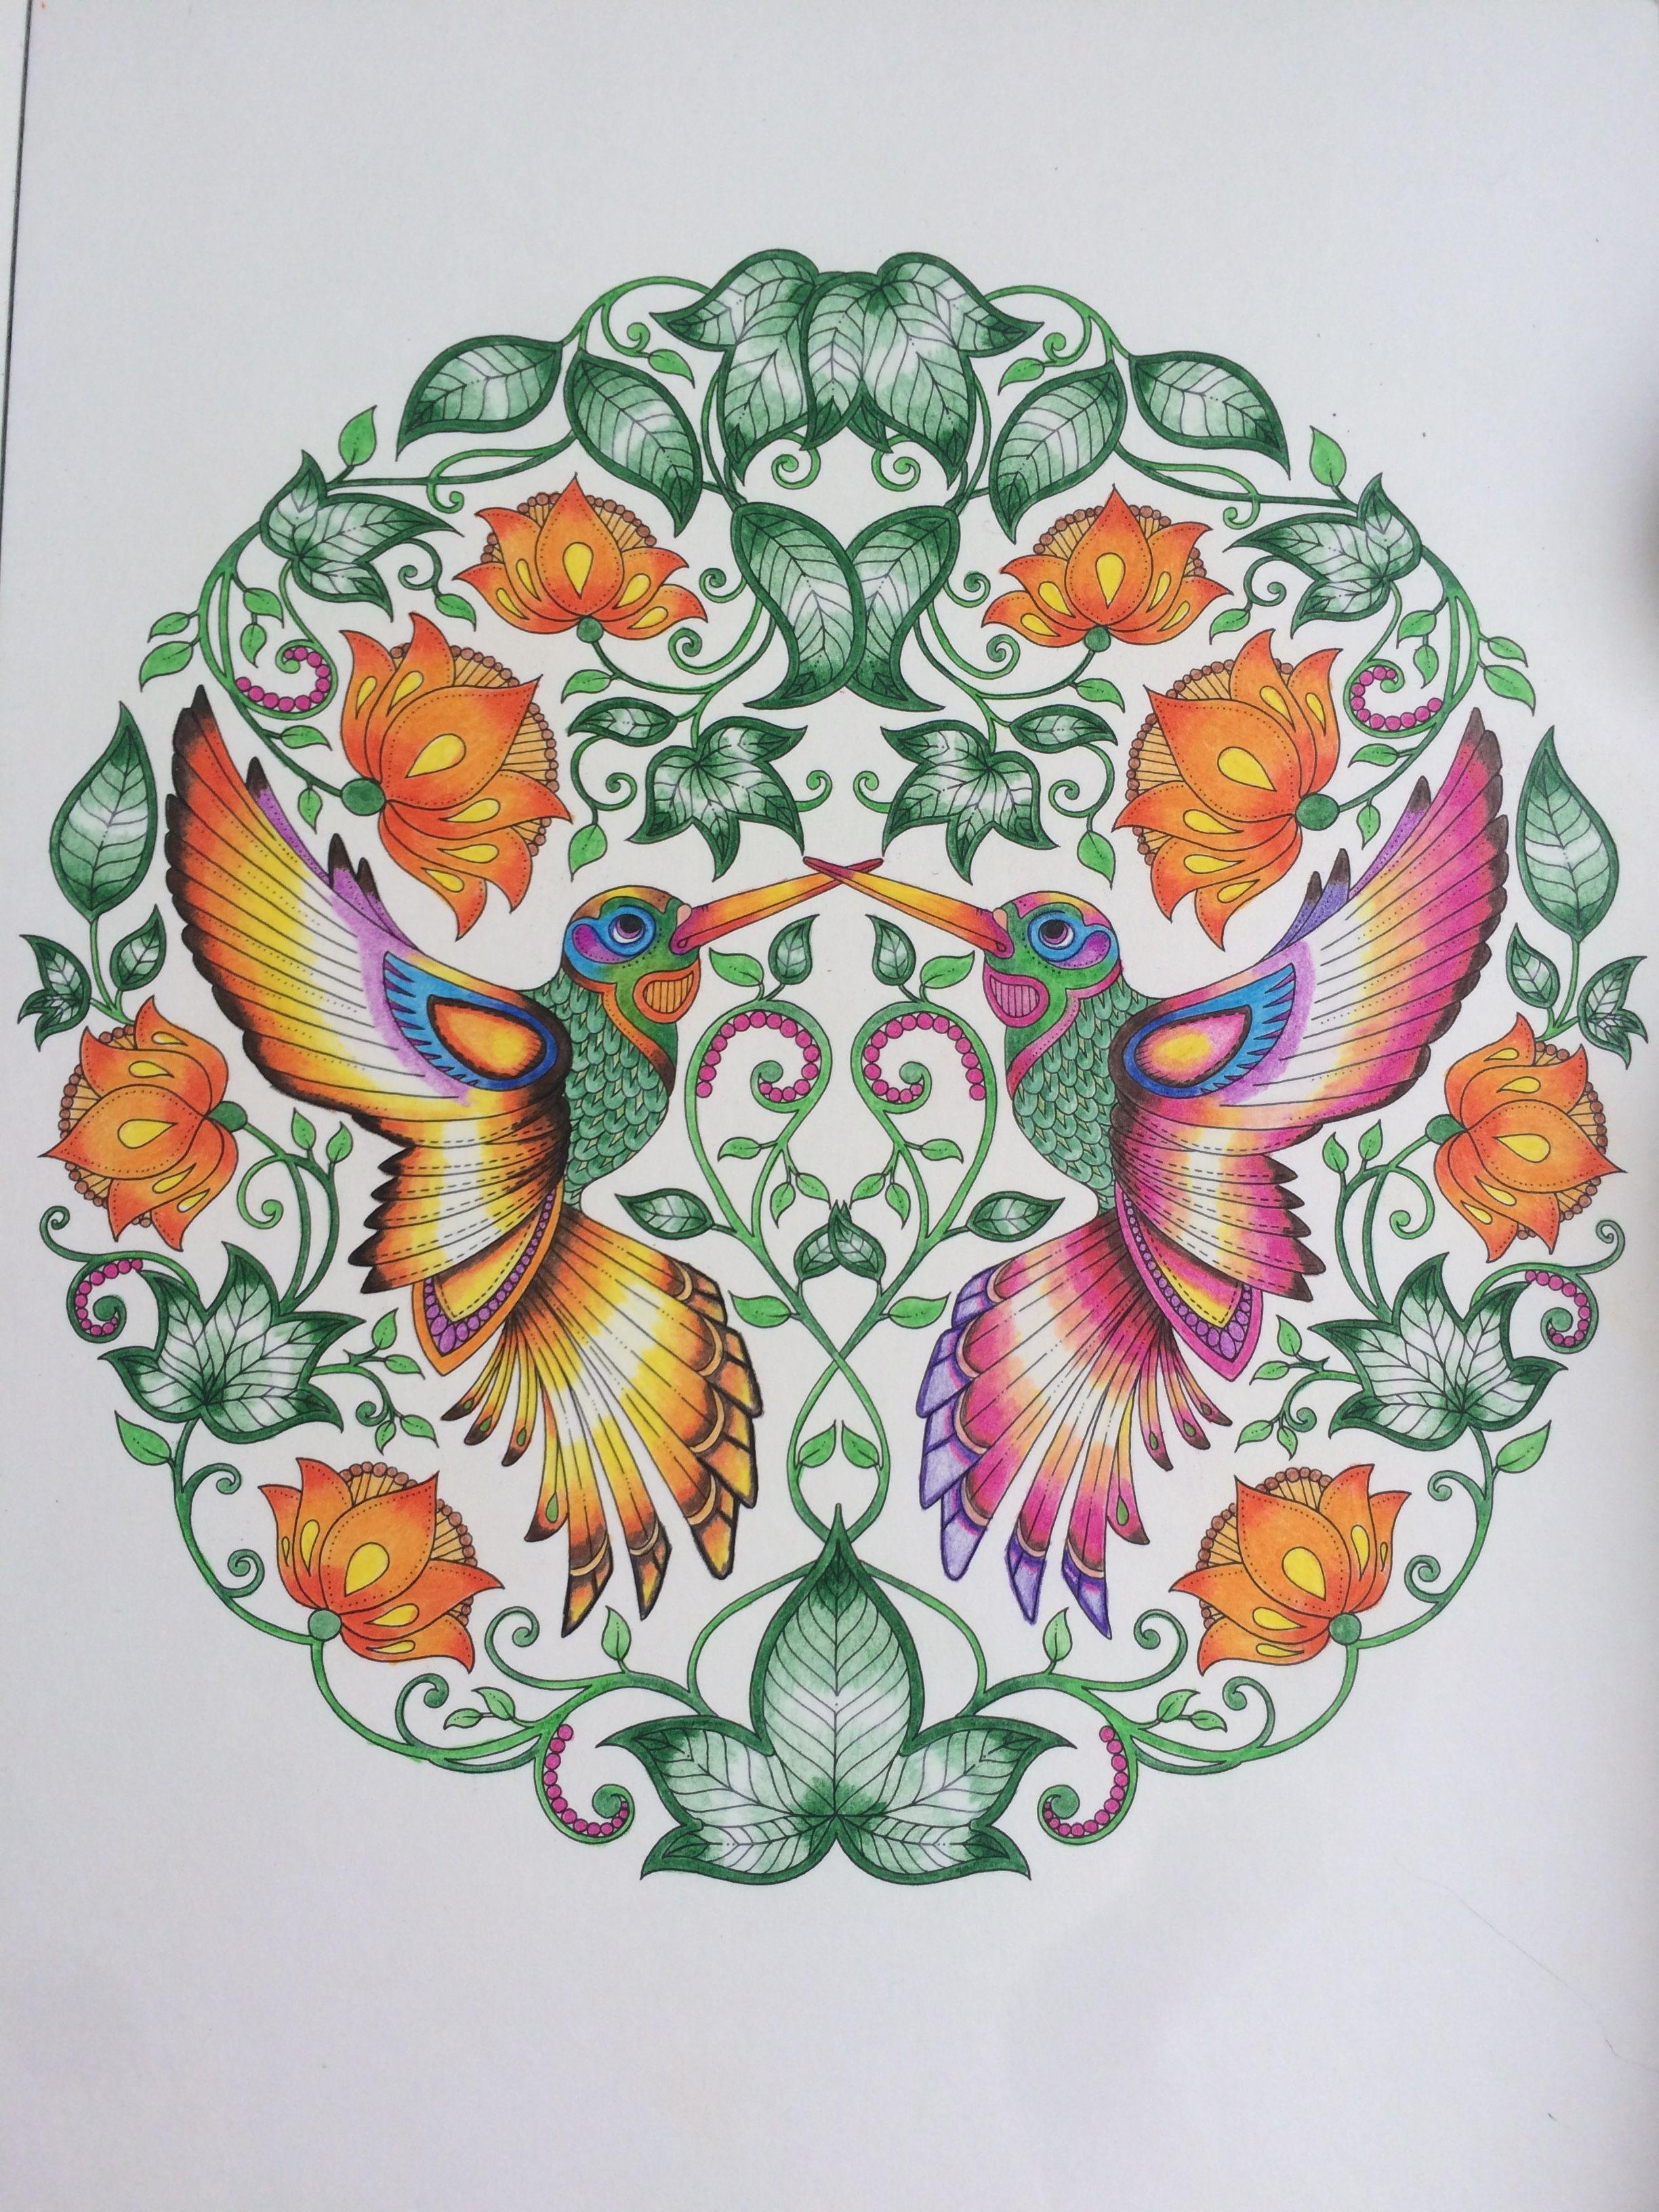 No Facebook Adult Coloring Pages Books Colored Pencils Johanna Basford Secret Garden Colouring Birds